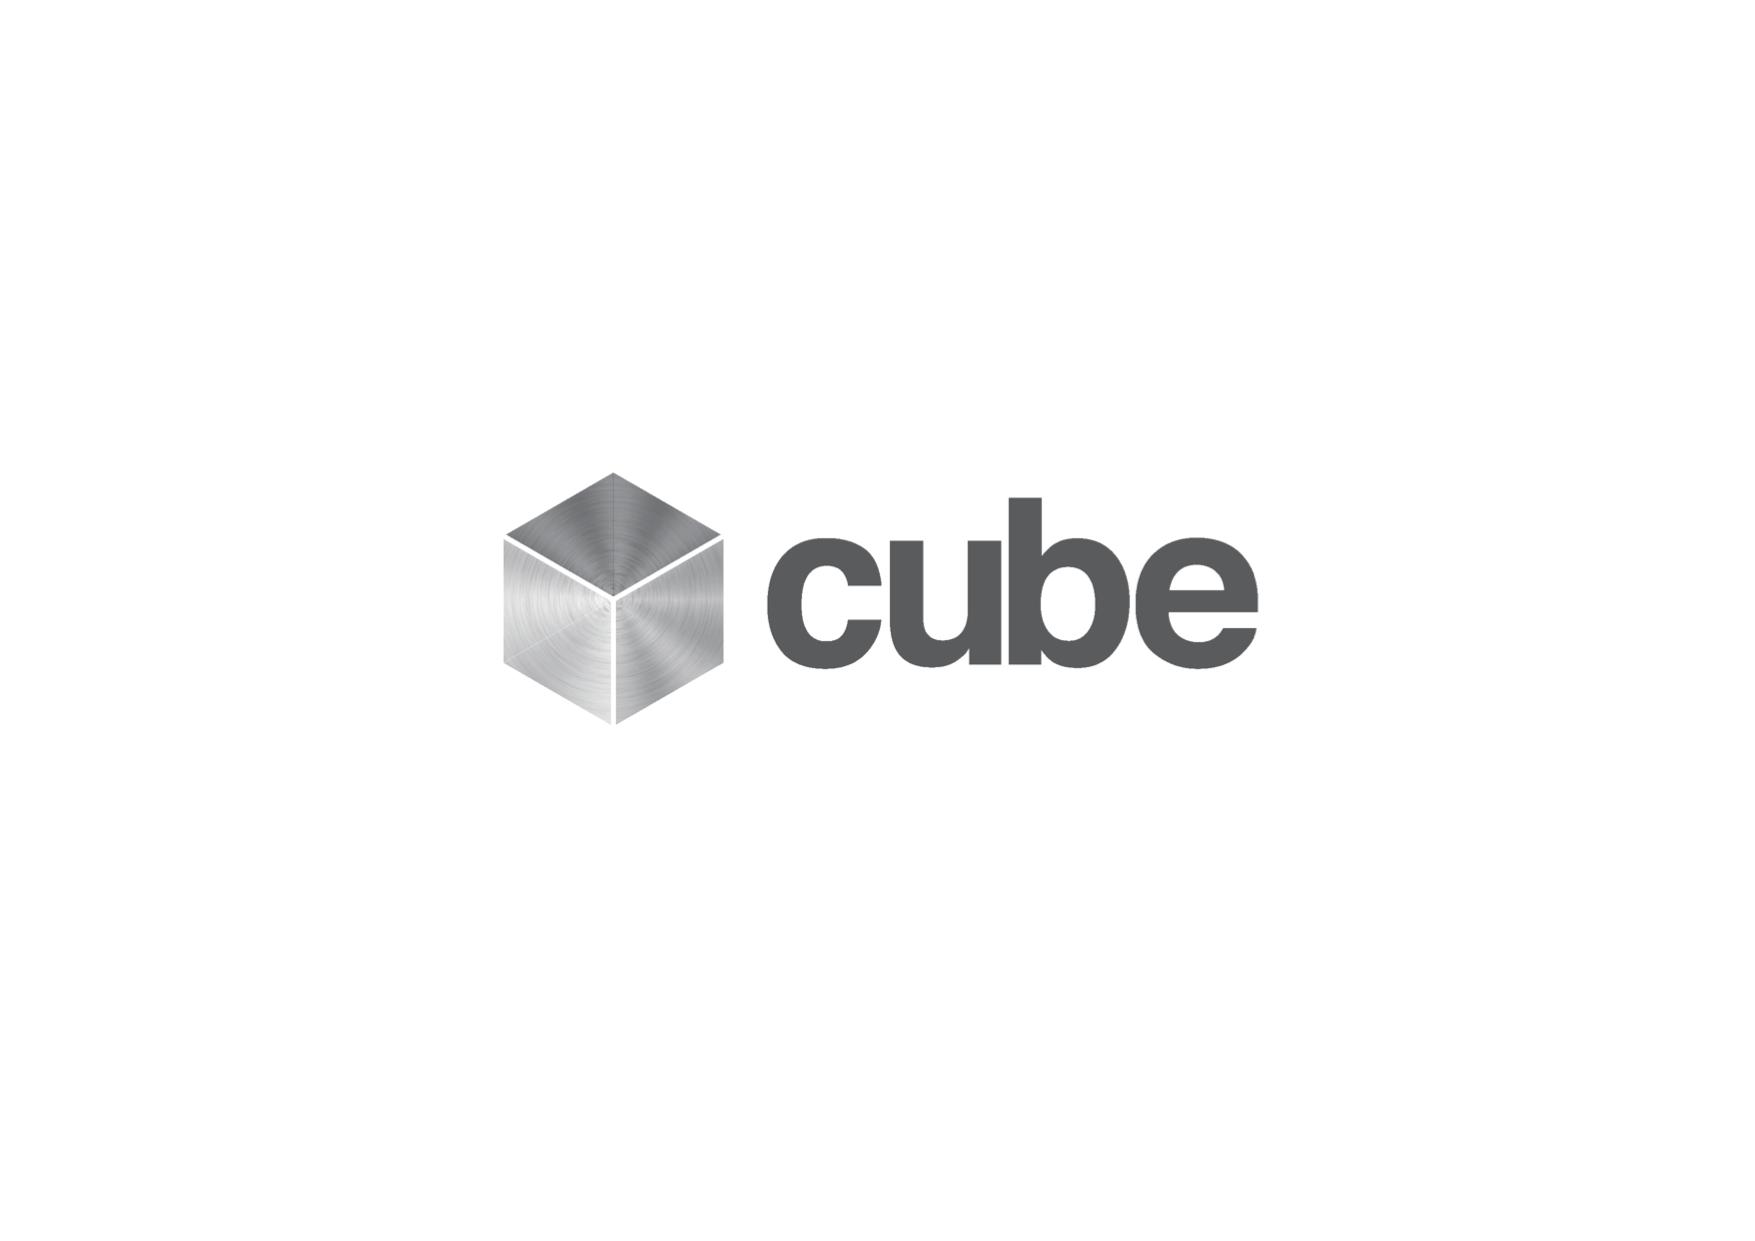 Create a logo for Cube, astartup in Palo Alto, CA.